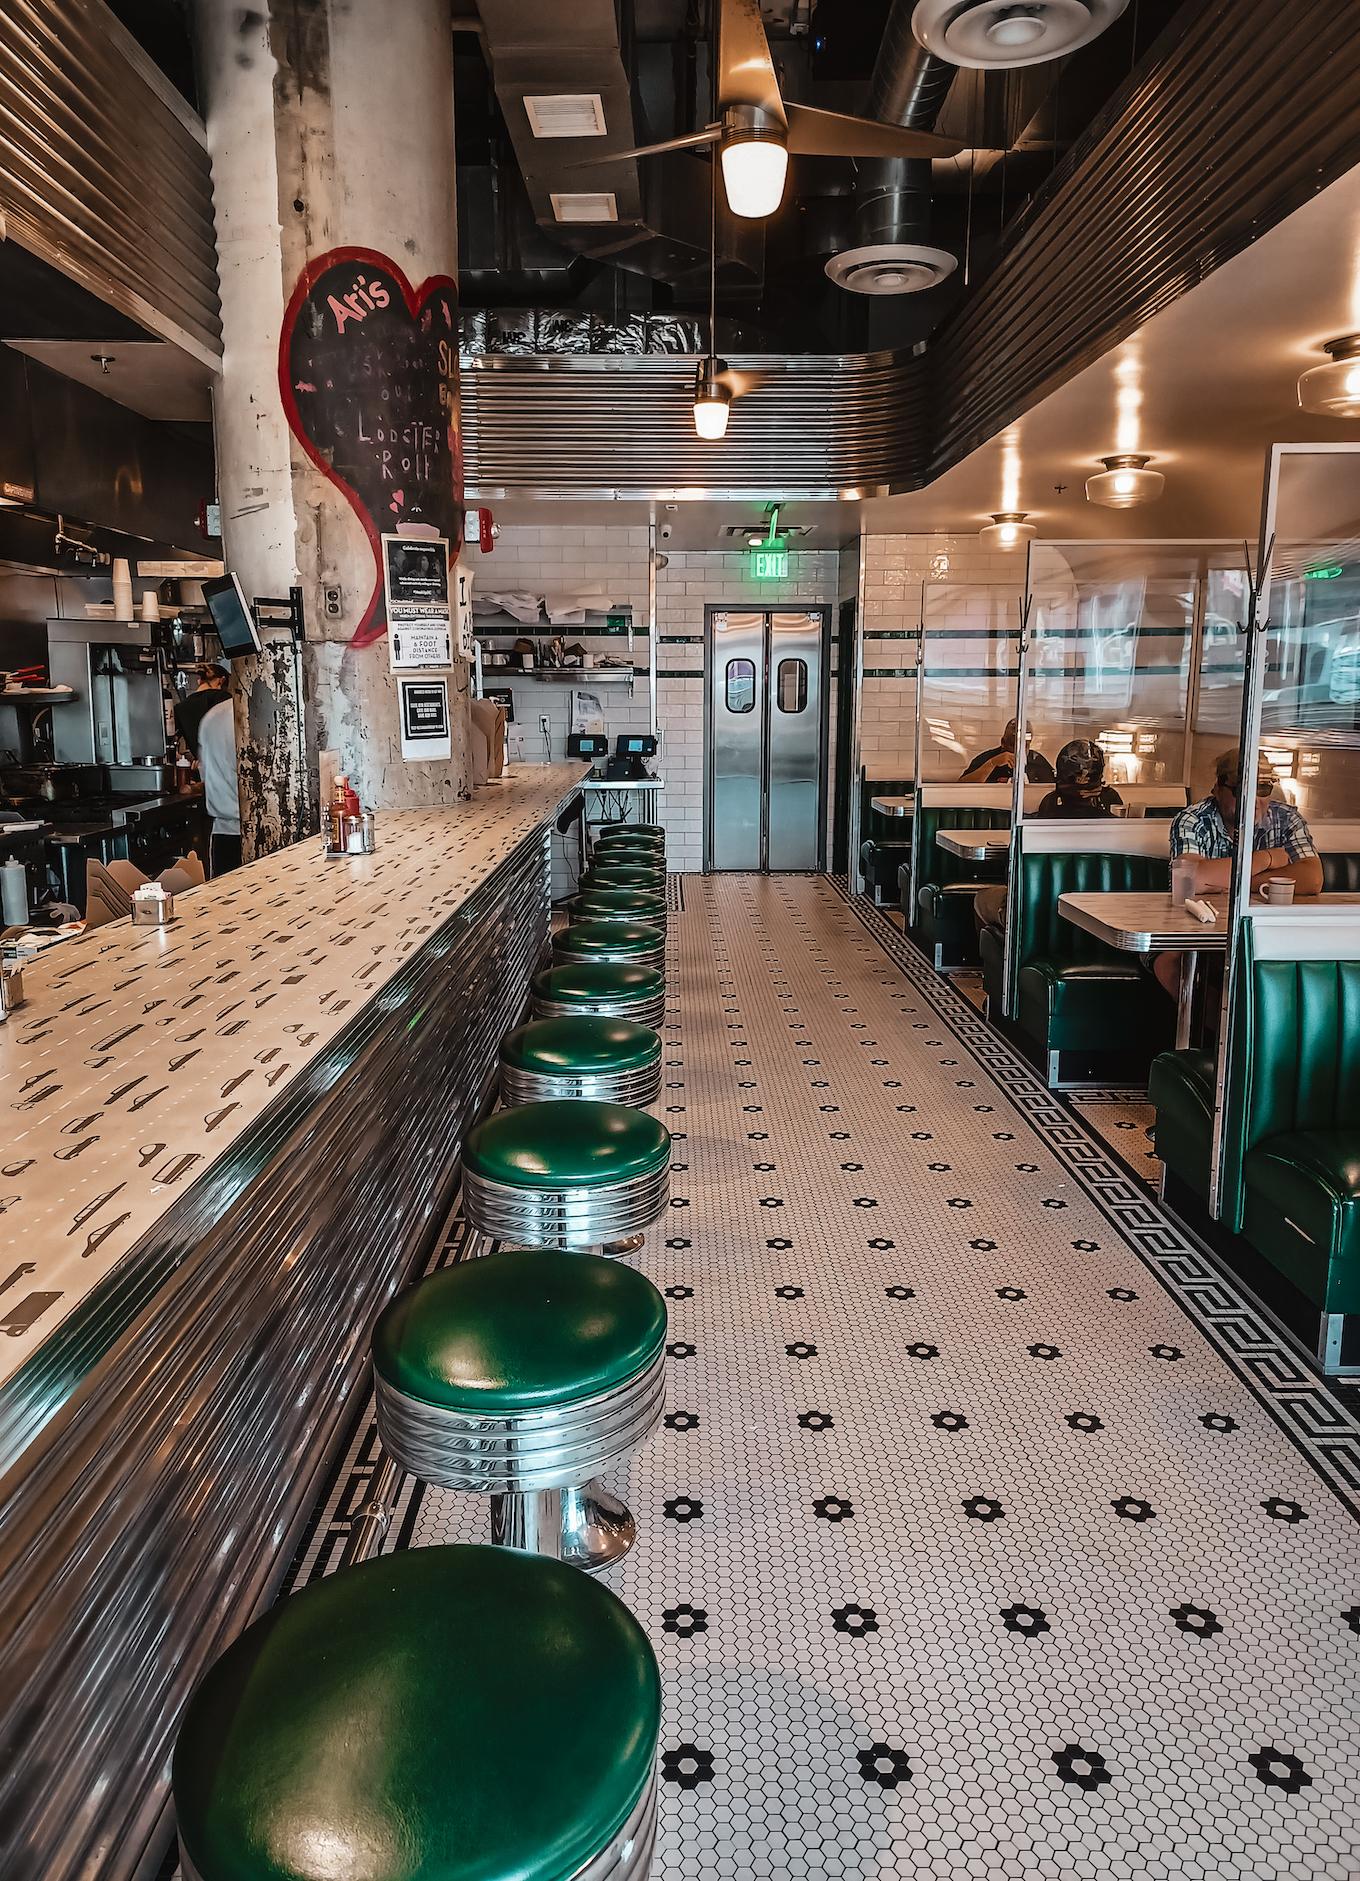 Image of the interior of Ari's Diner in Northeast Washington DC